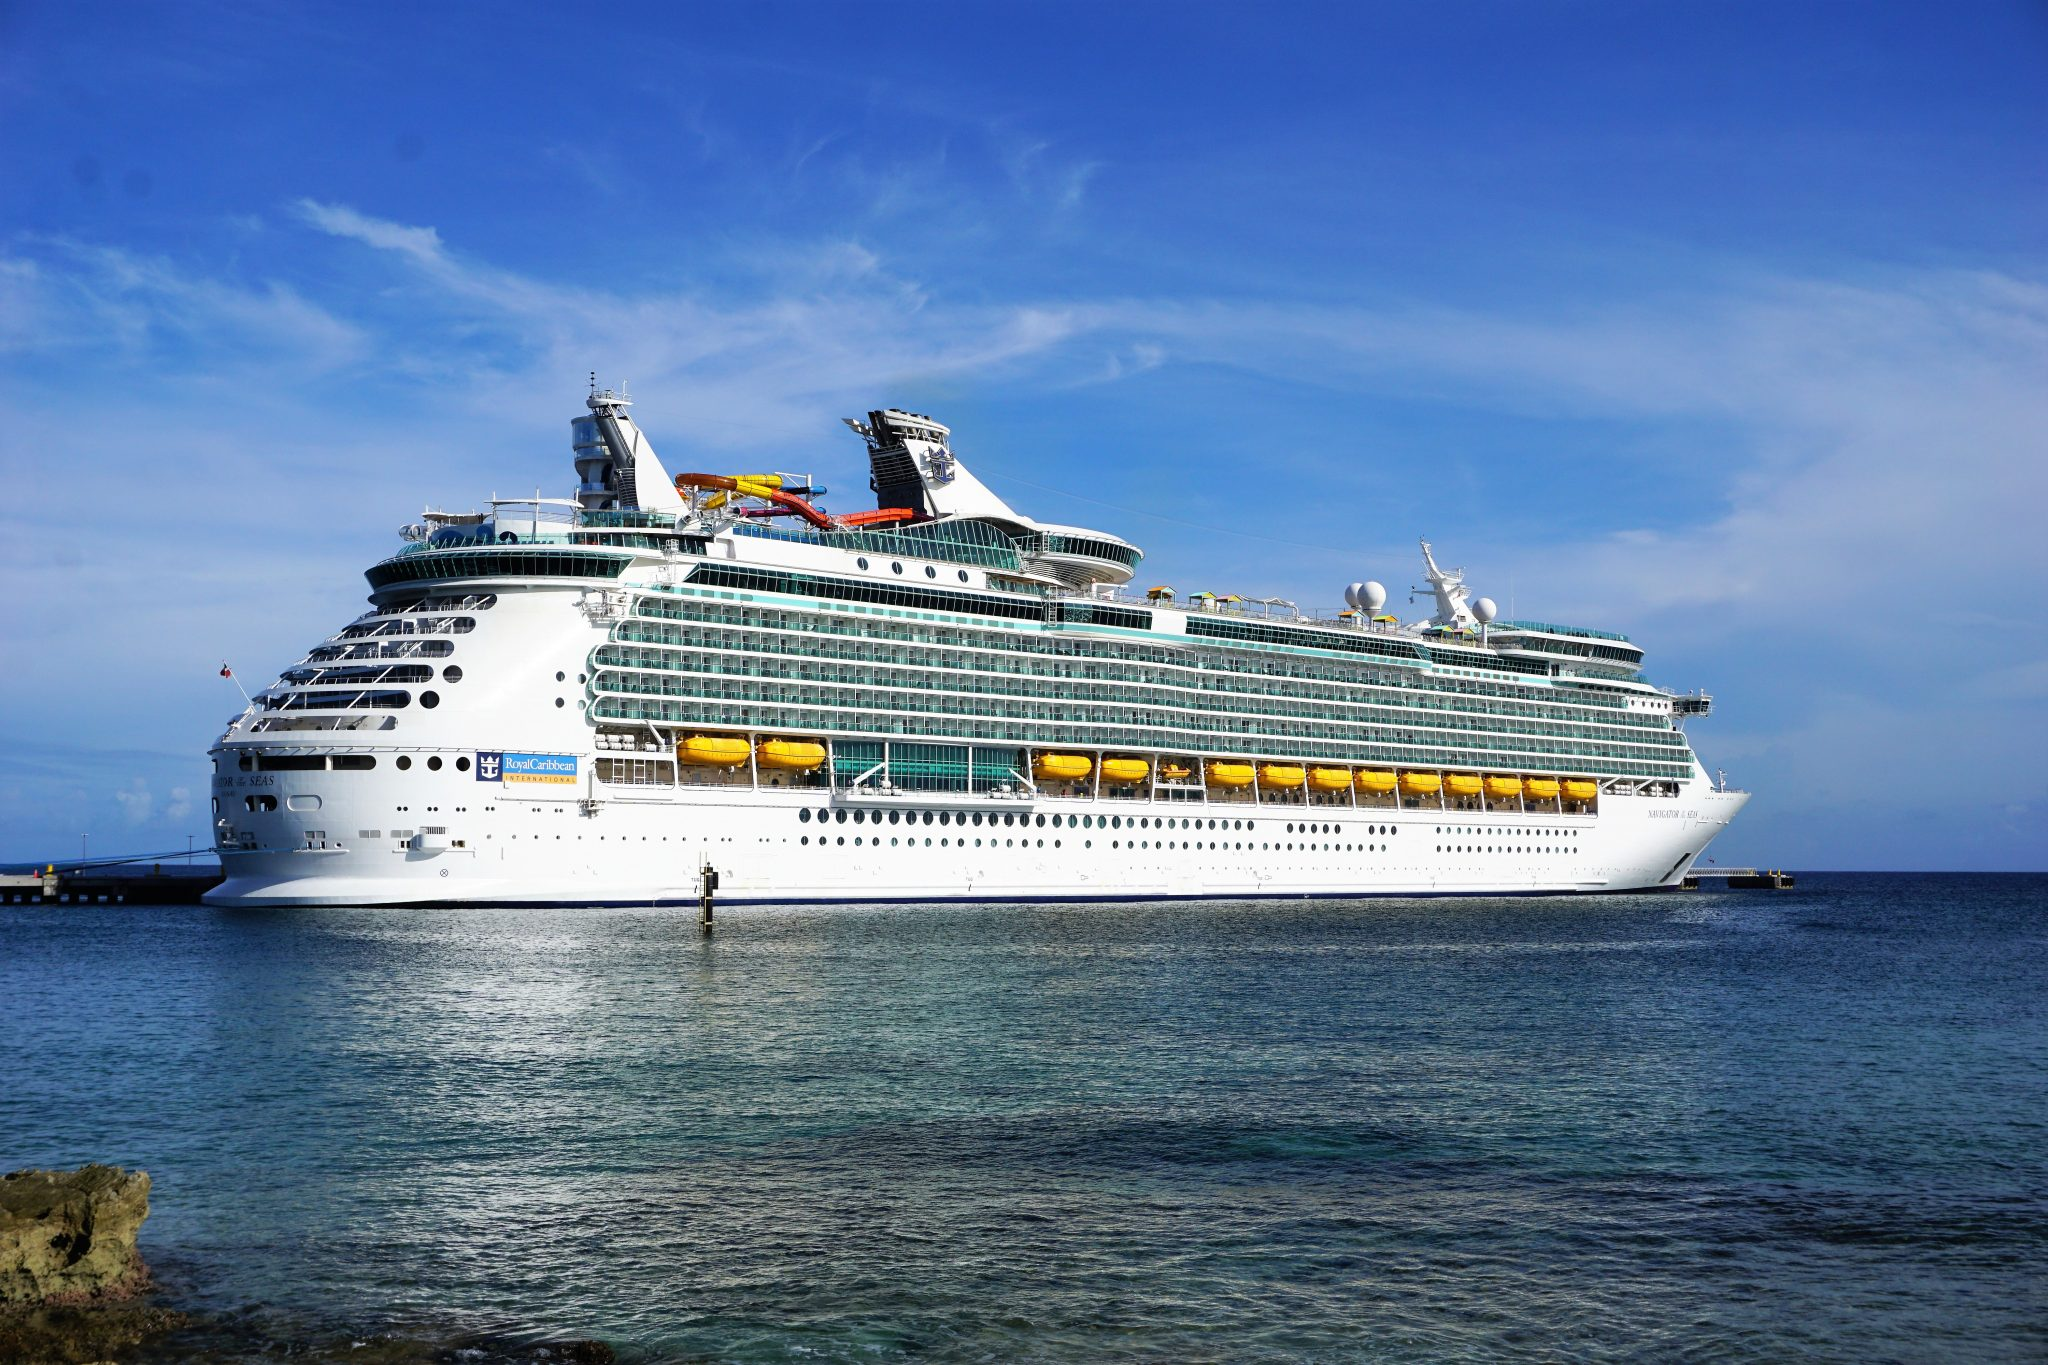 We Love Royal Caribbean Cruise Ships